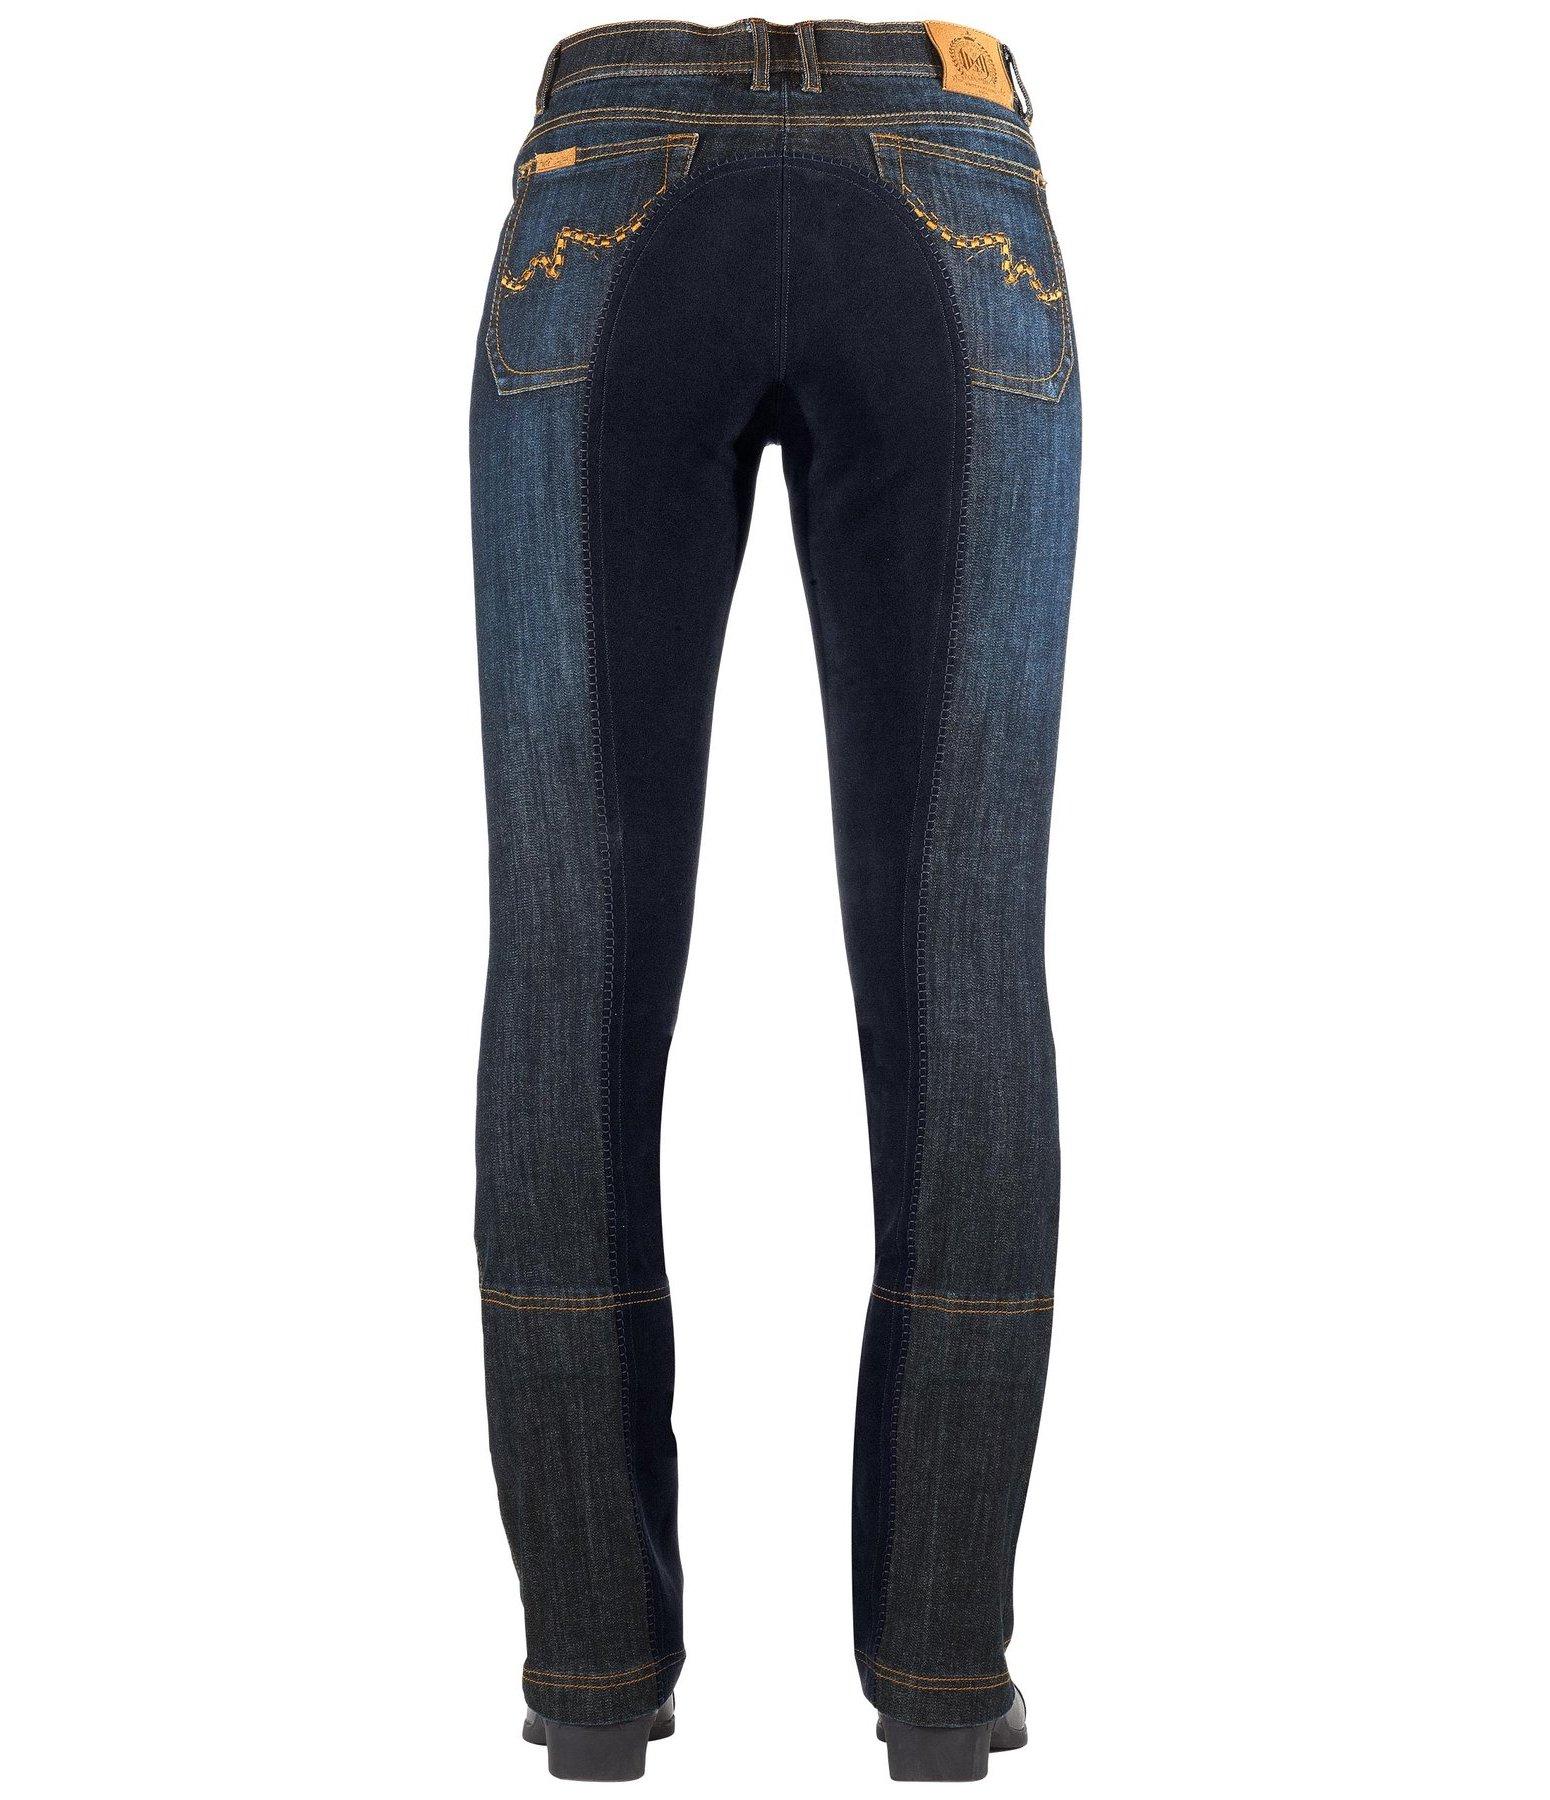 Felix Bühler Jeans-Jodhpurreithose Helena